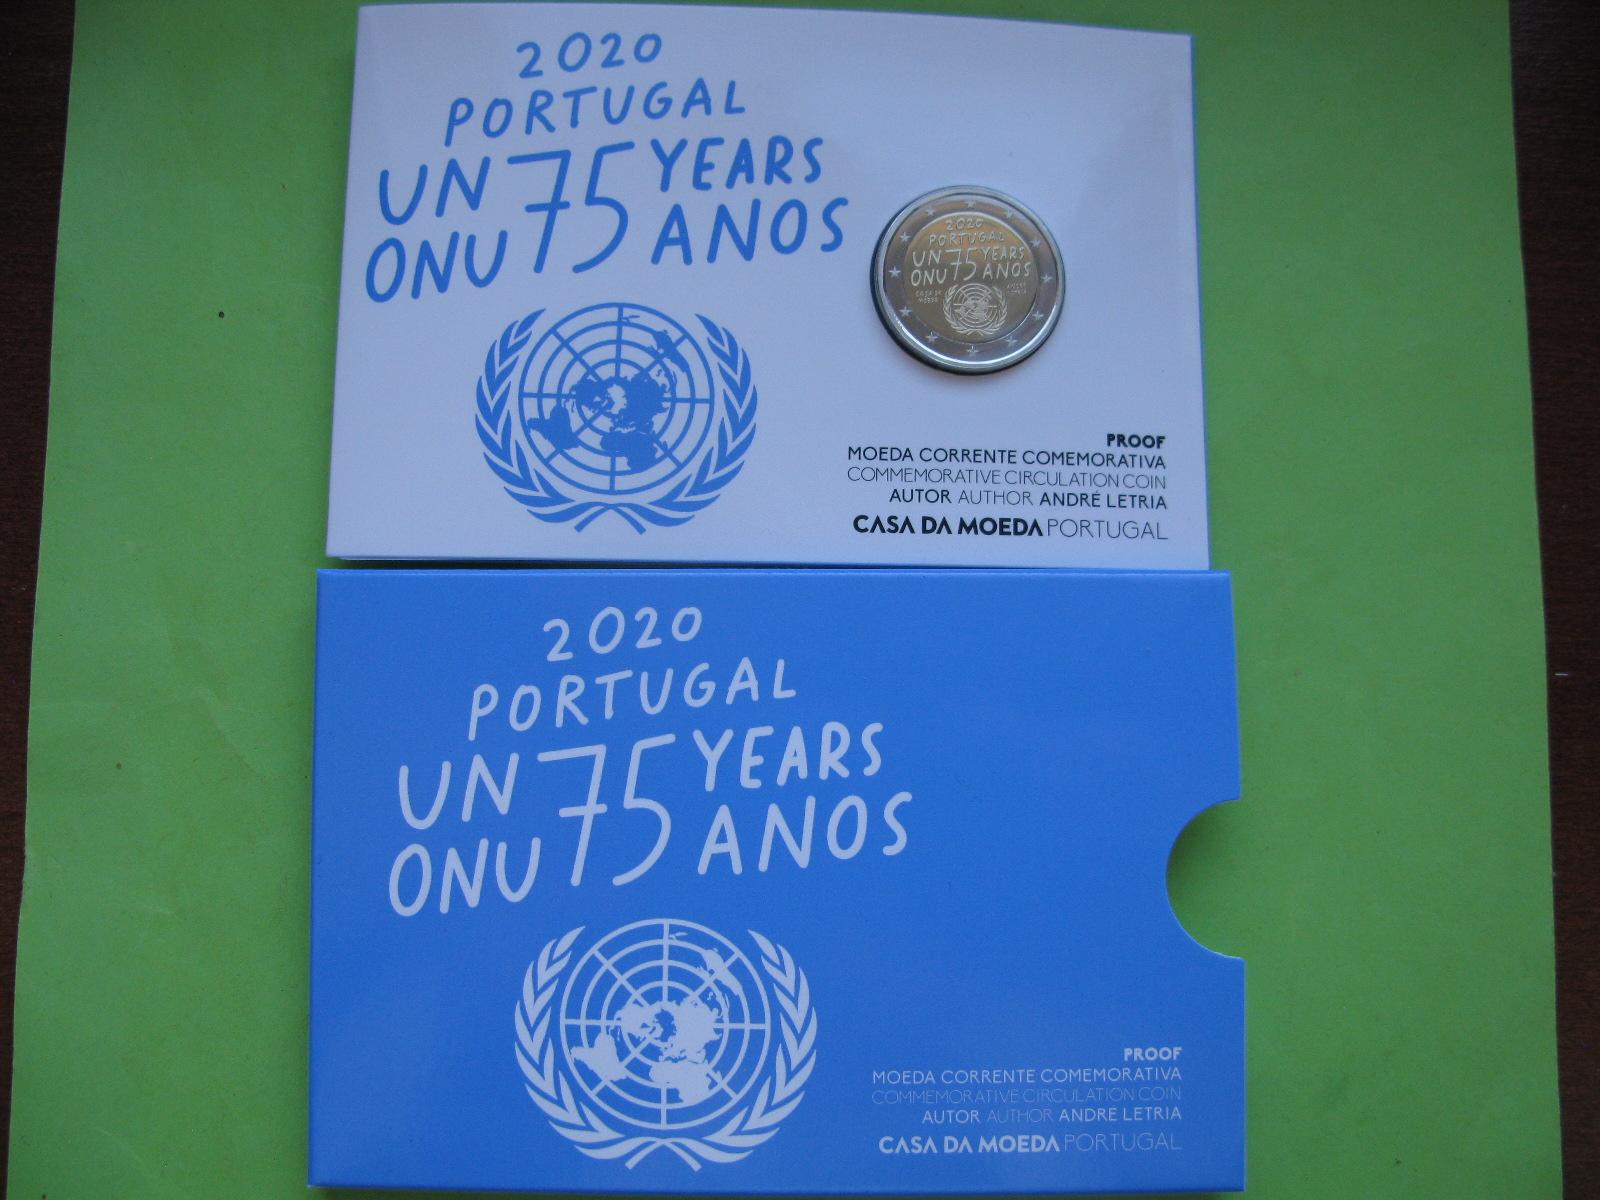 Португалия 2 евро 2020 г. 75 лет ООН (пруф)